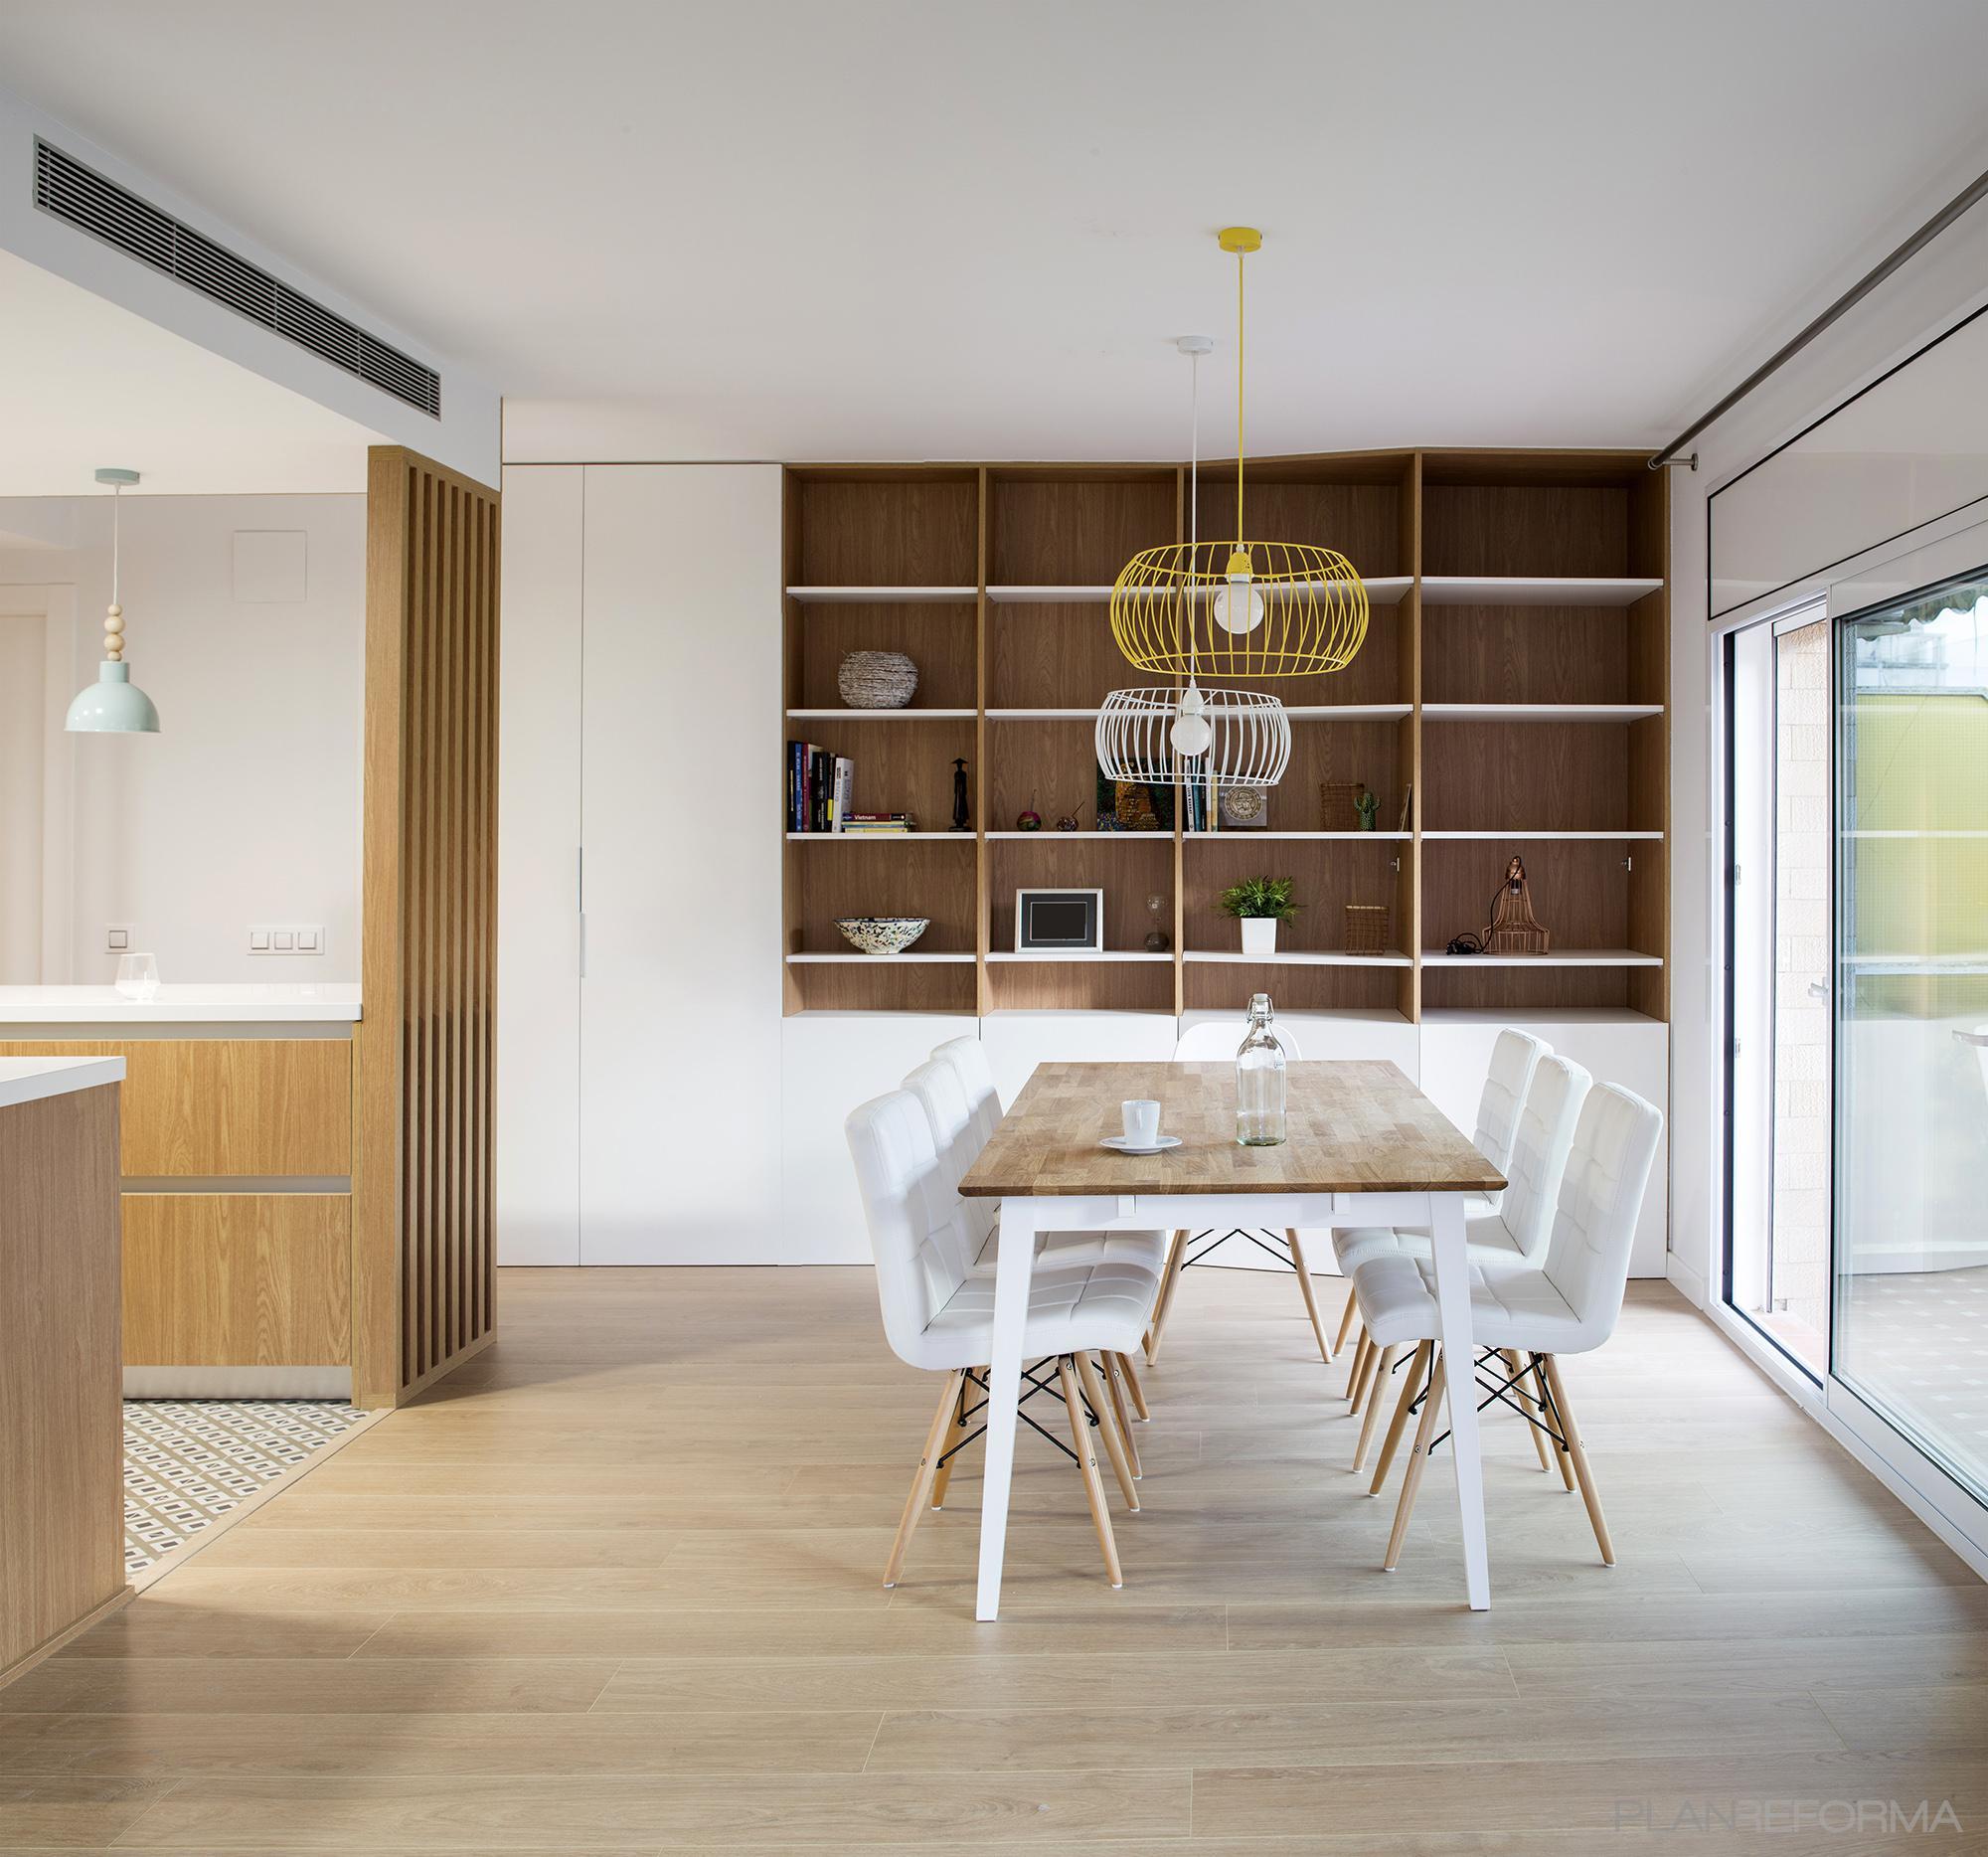 Comedor, Cocina, Salon Estilo moderno Color amarillo, verde, blanco  diseñado por Albert Brito. Arquitectura   Arquitecto   Copyright Flavio Coddou